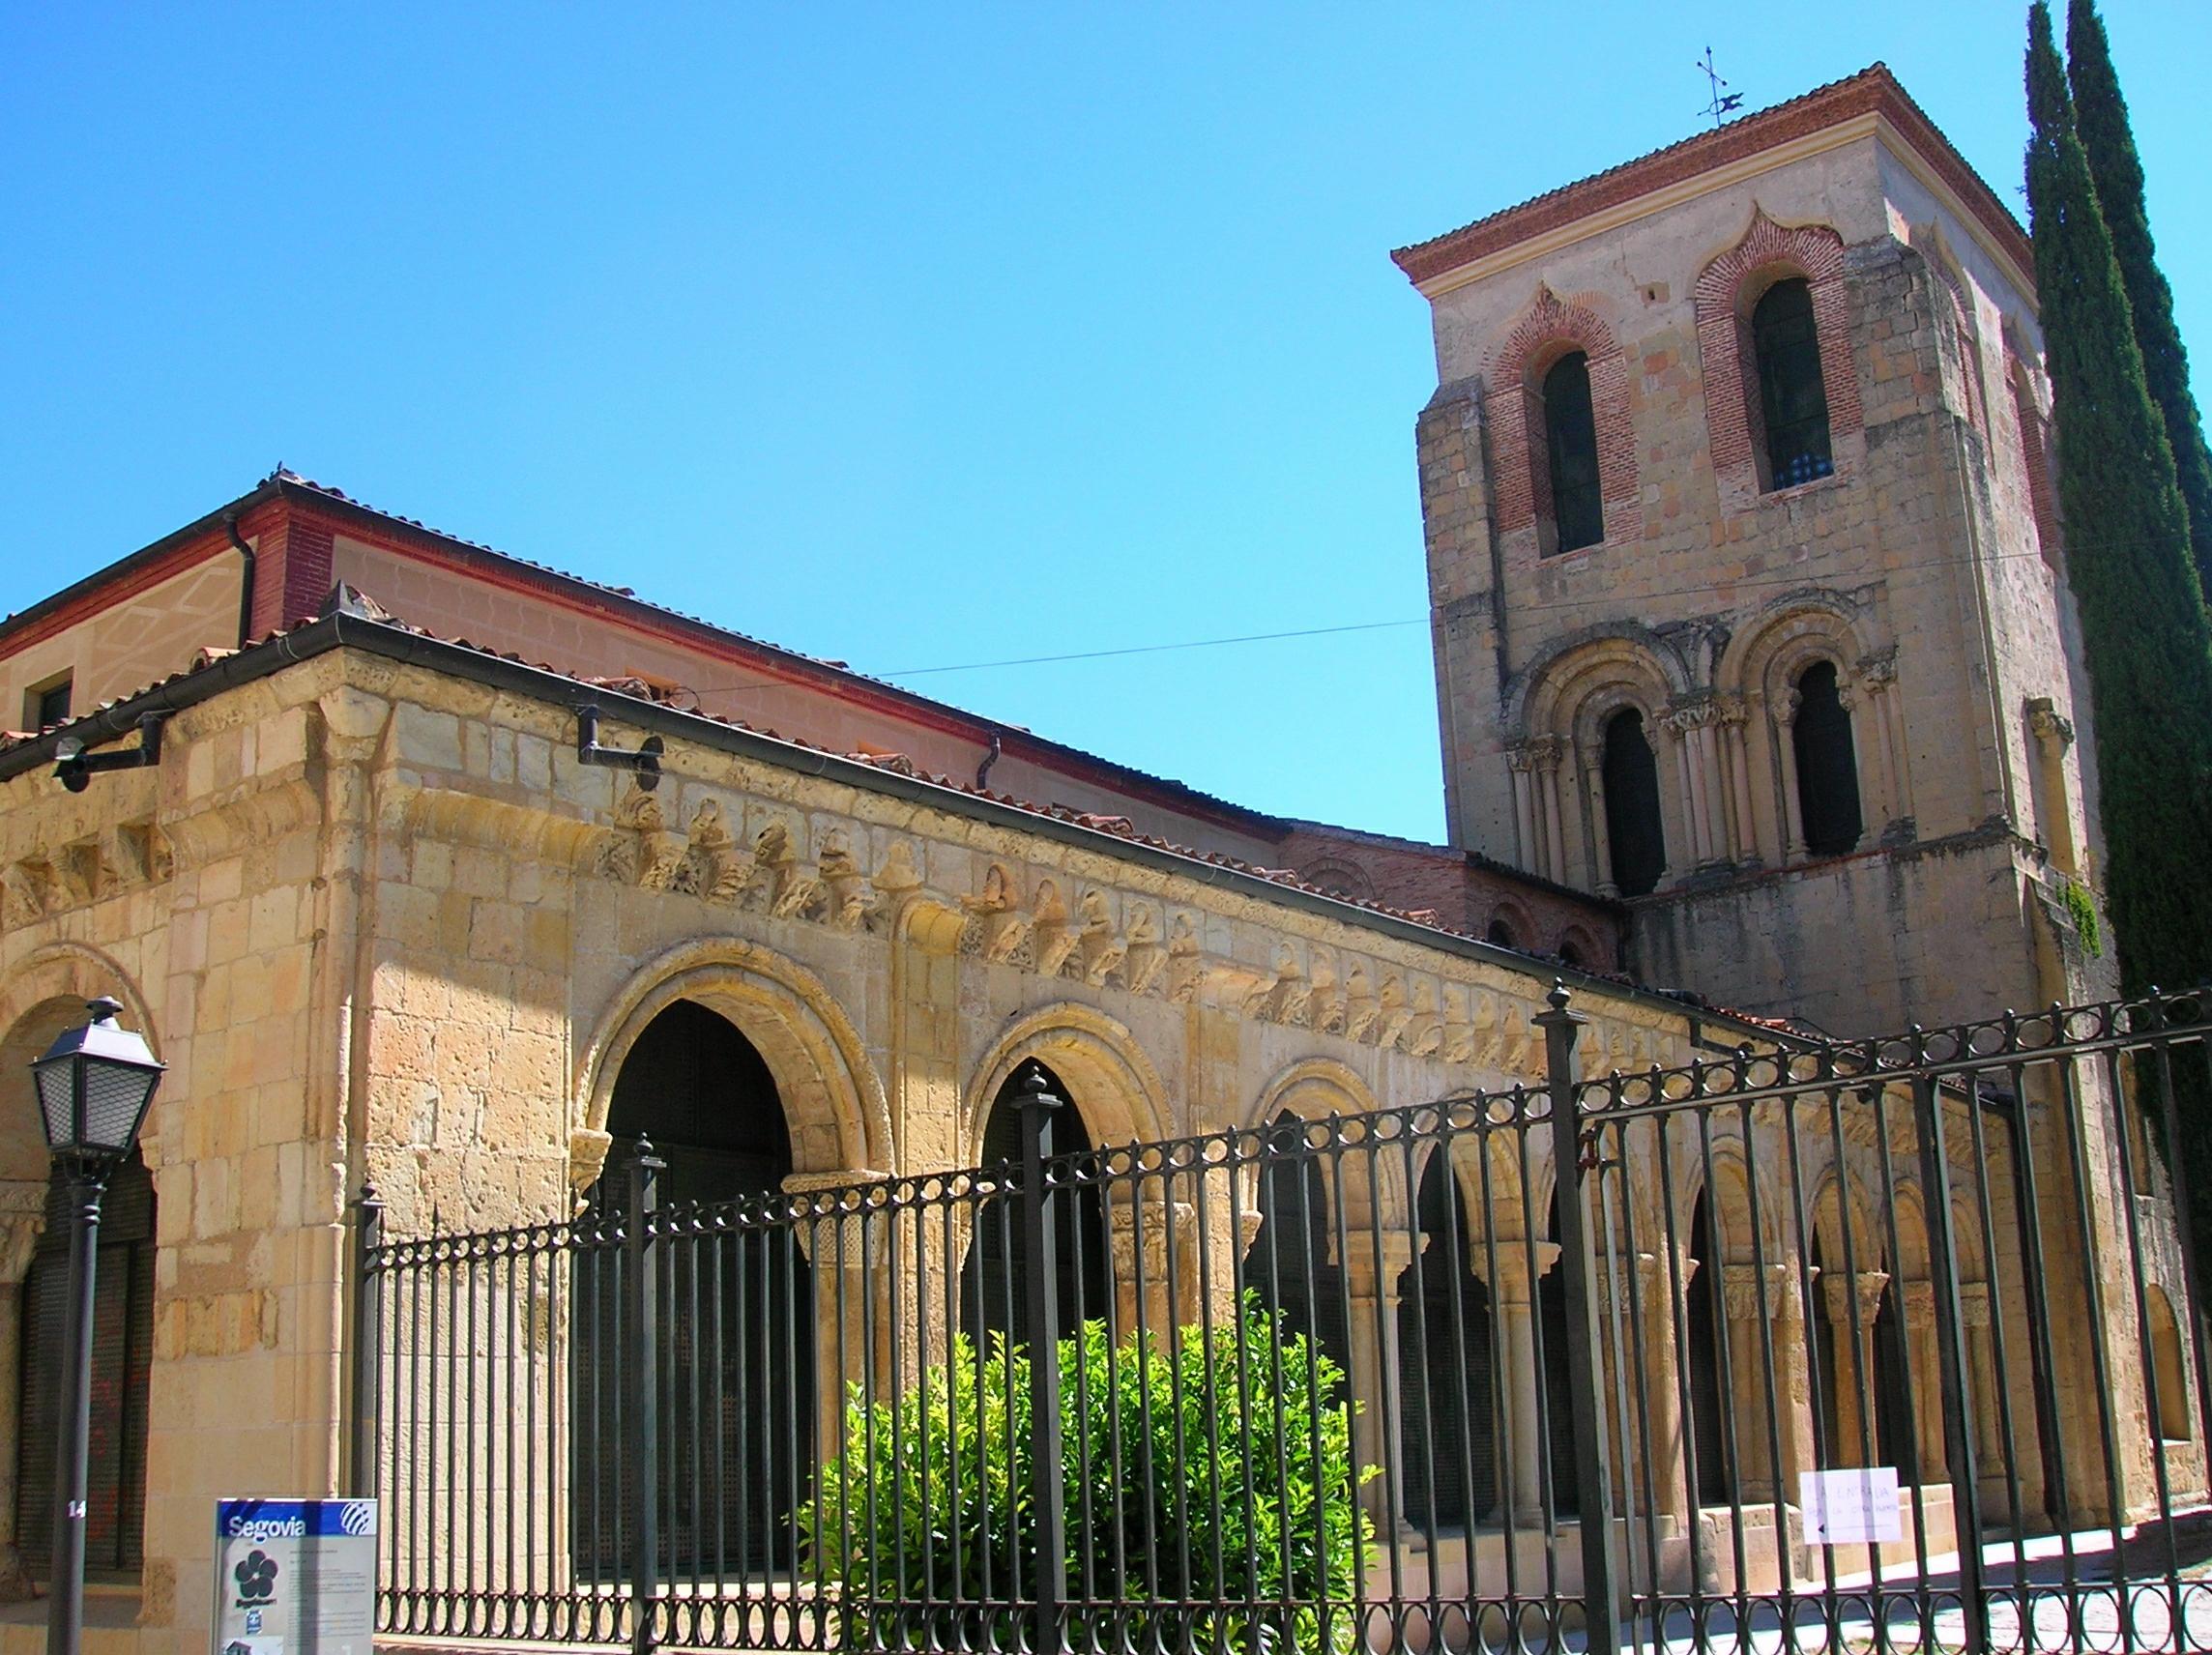 File:Segovia - San Juan de los Caballeros-Museo Zuloaga 01.jpg